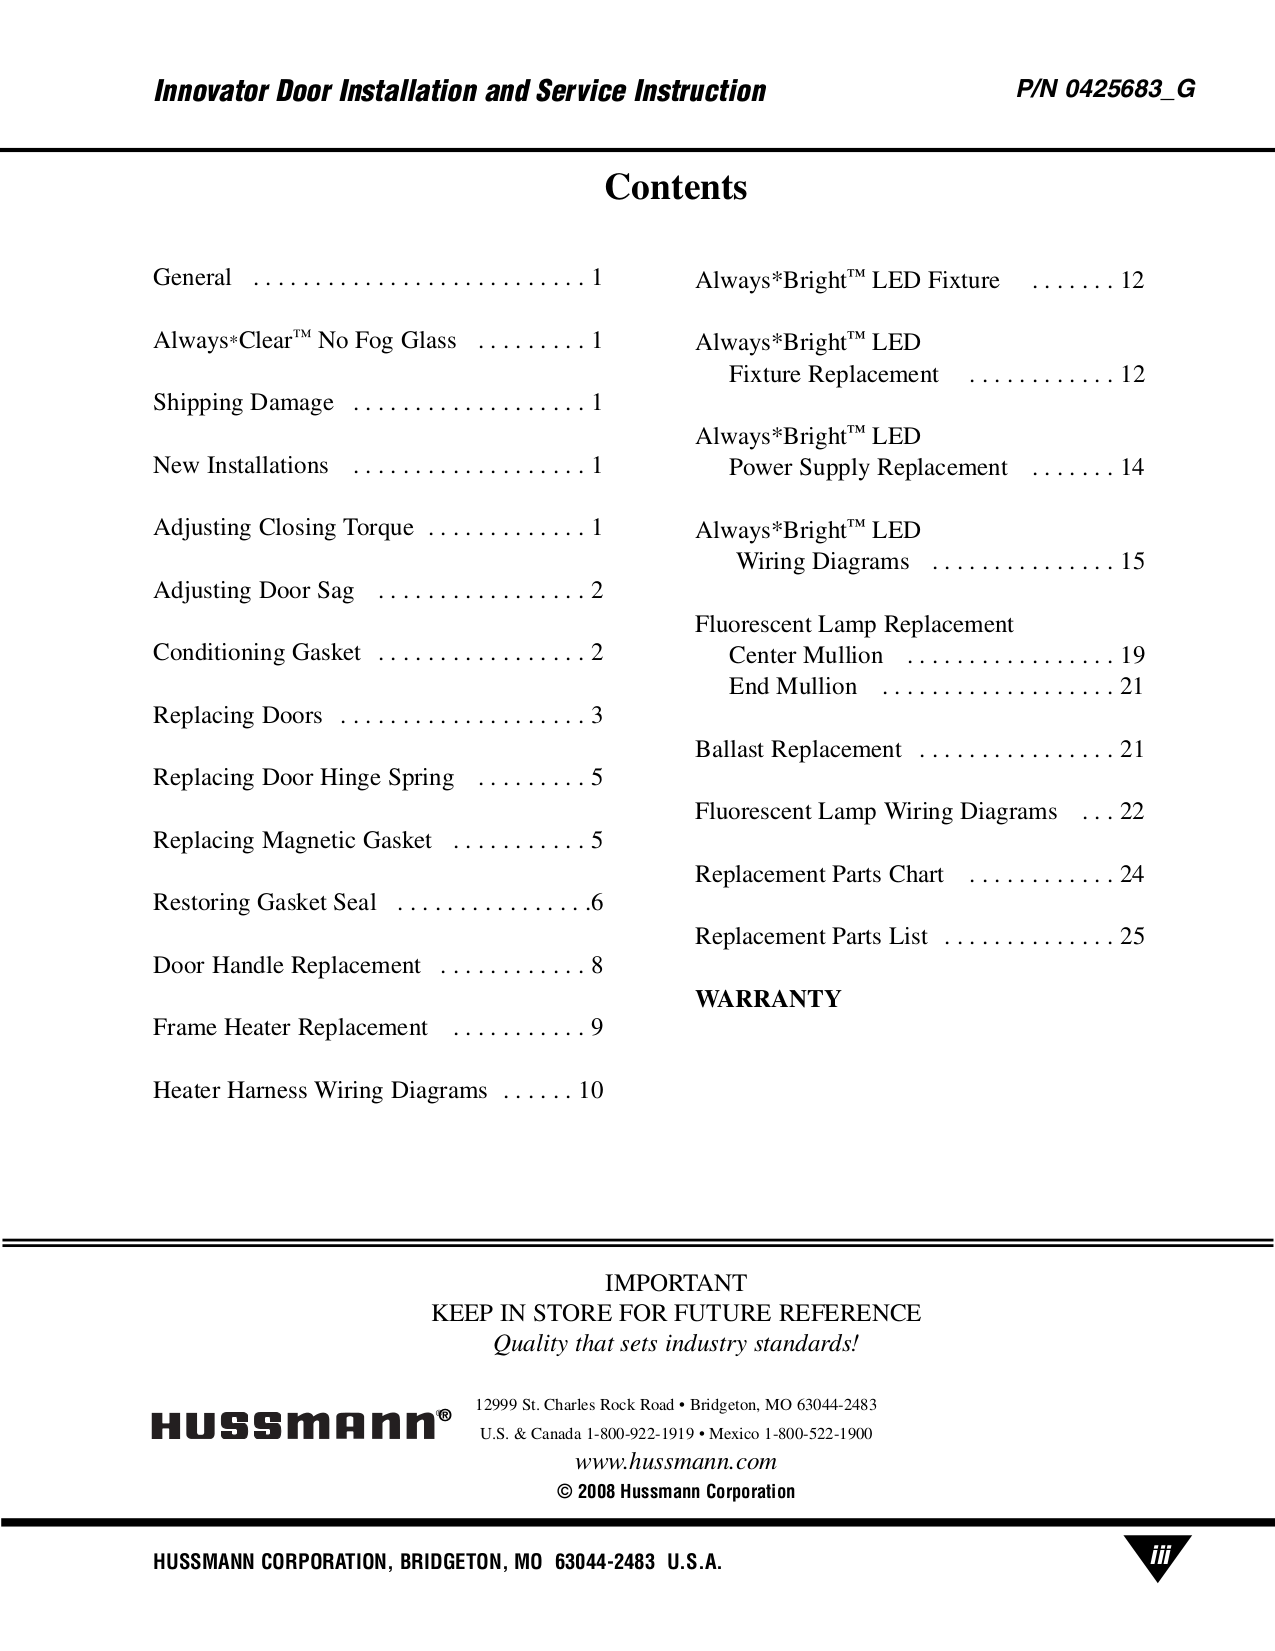 Hussmann RLN 5.pdf 2 hussmann rln 5 manual wiring diagrams wiring diagrams hussmann rl5 wiring diagram at gsmx.co